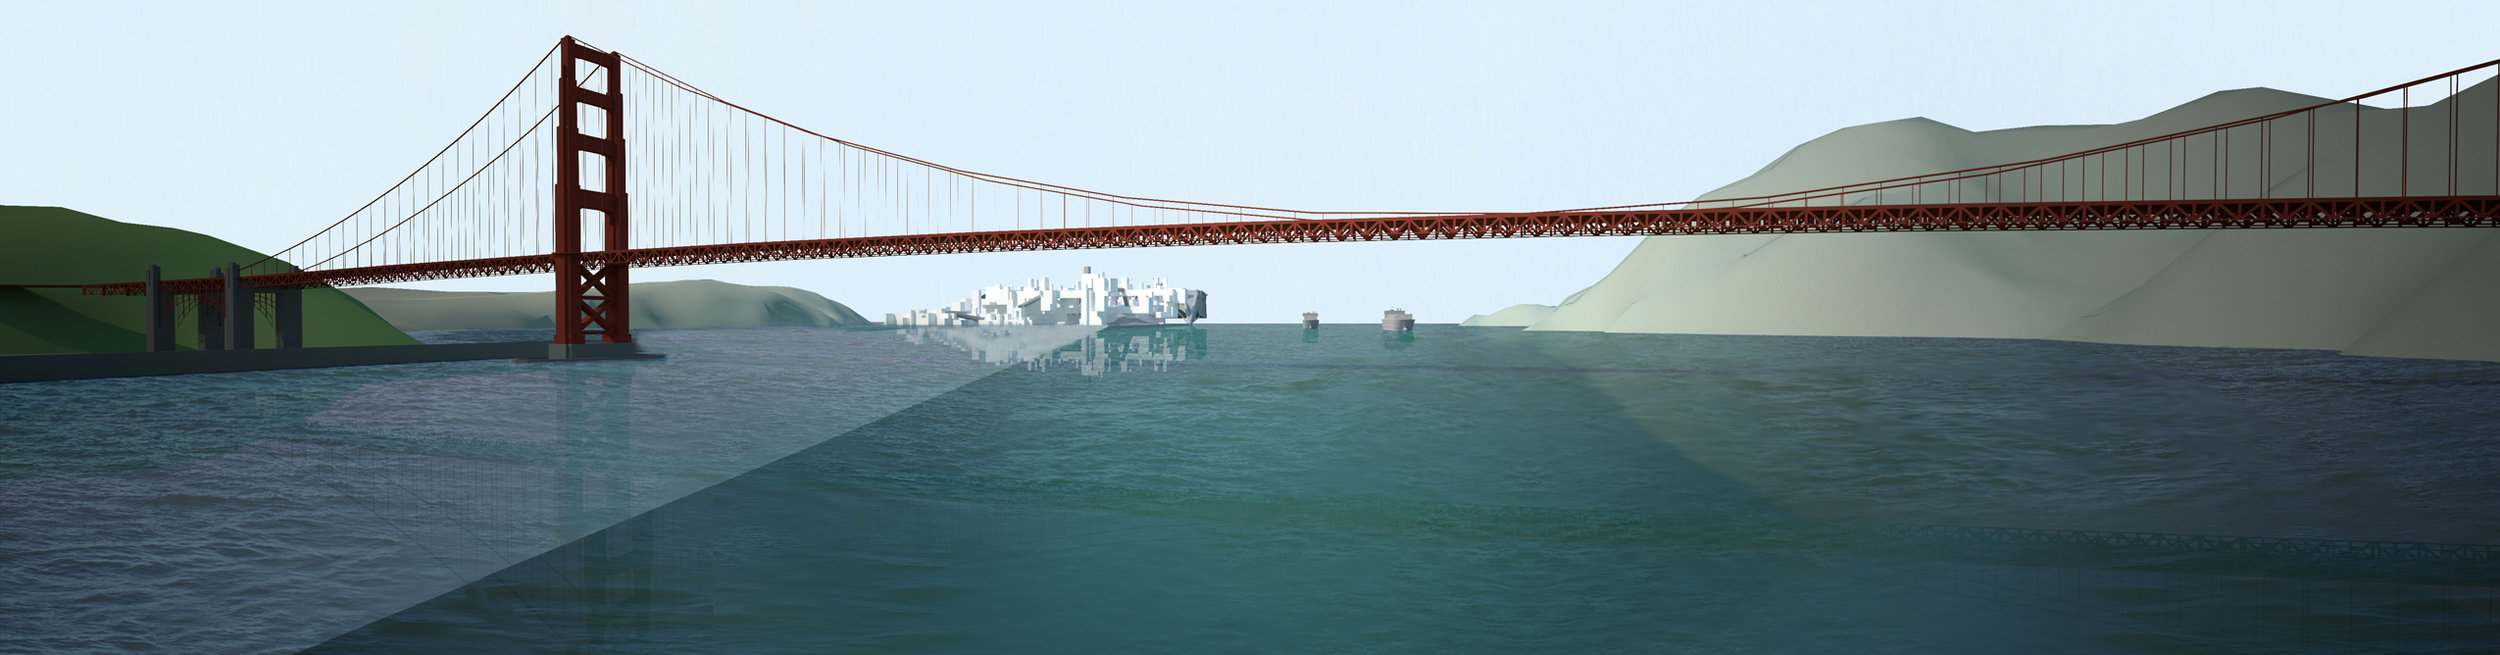 FINAL bridge_image.jpg